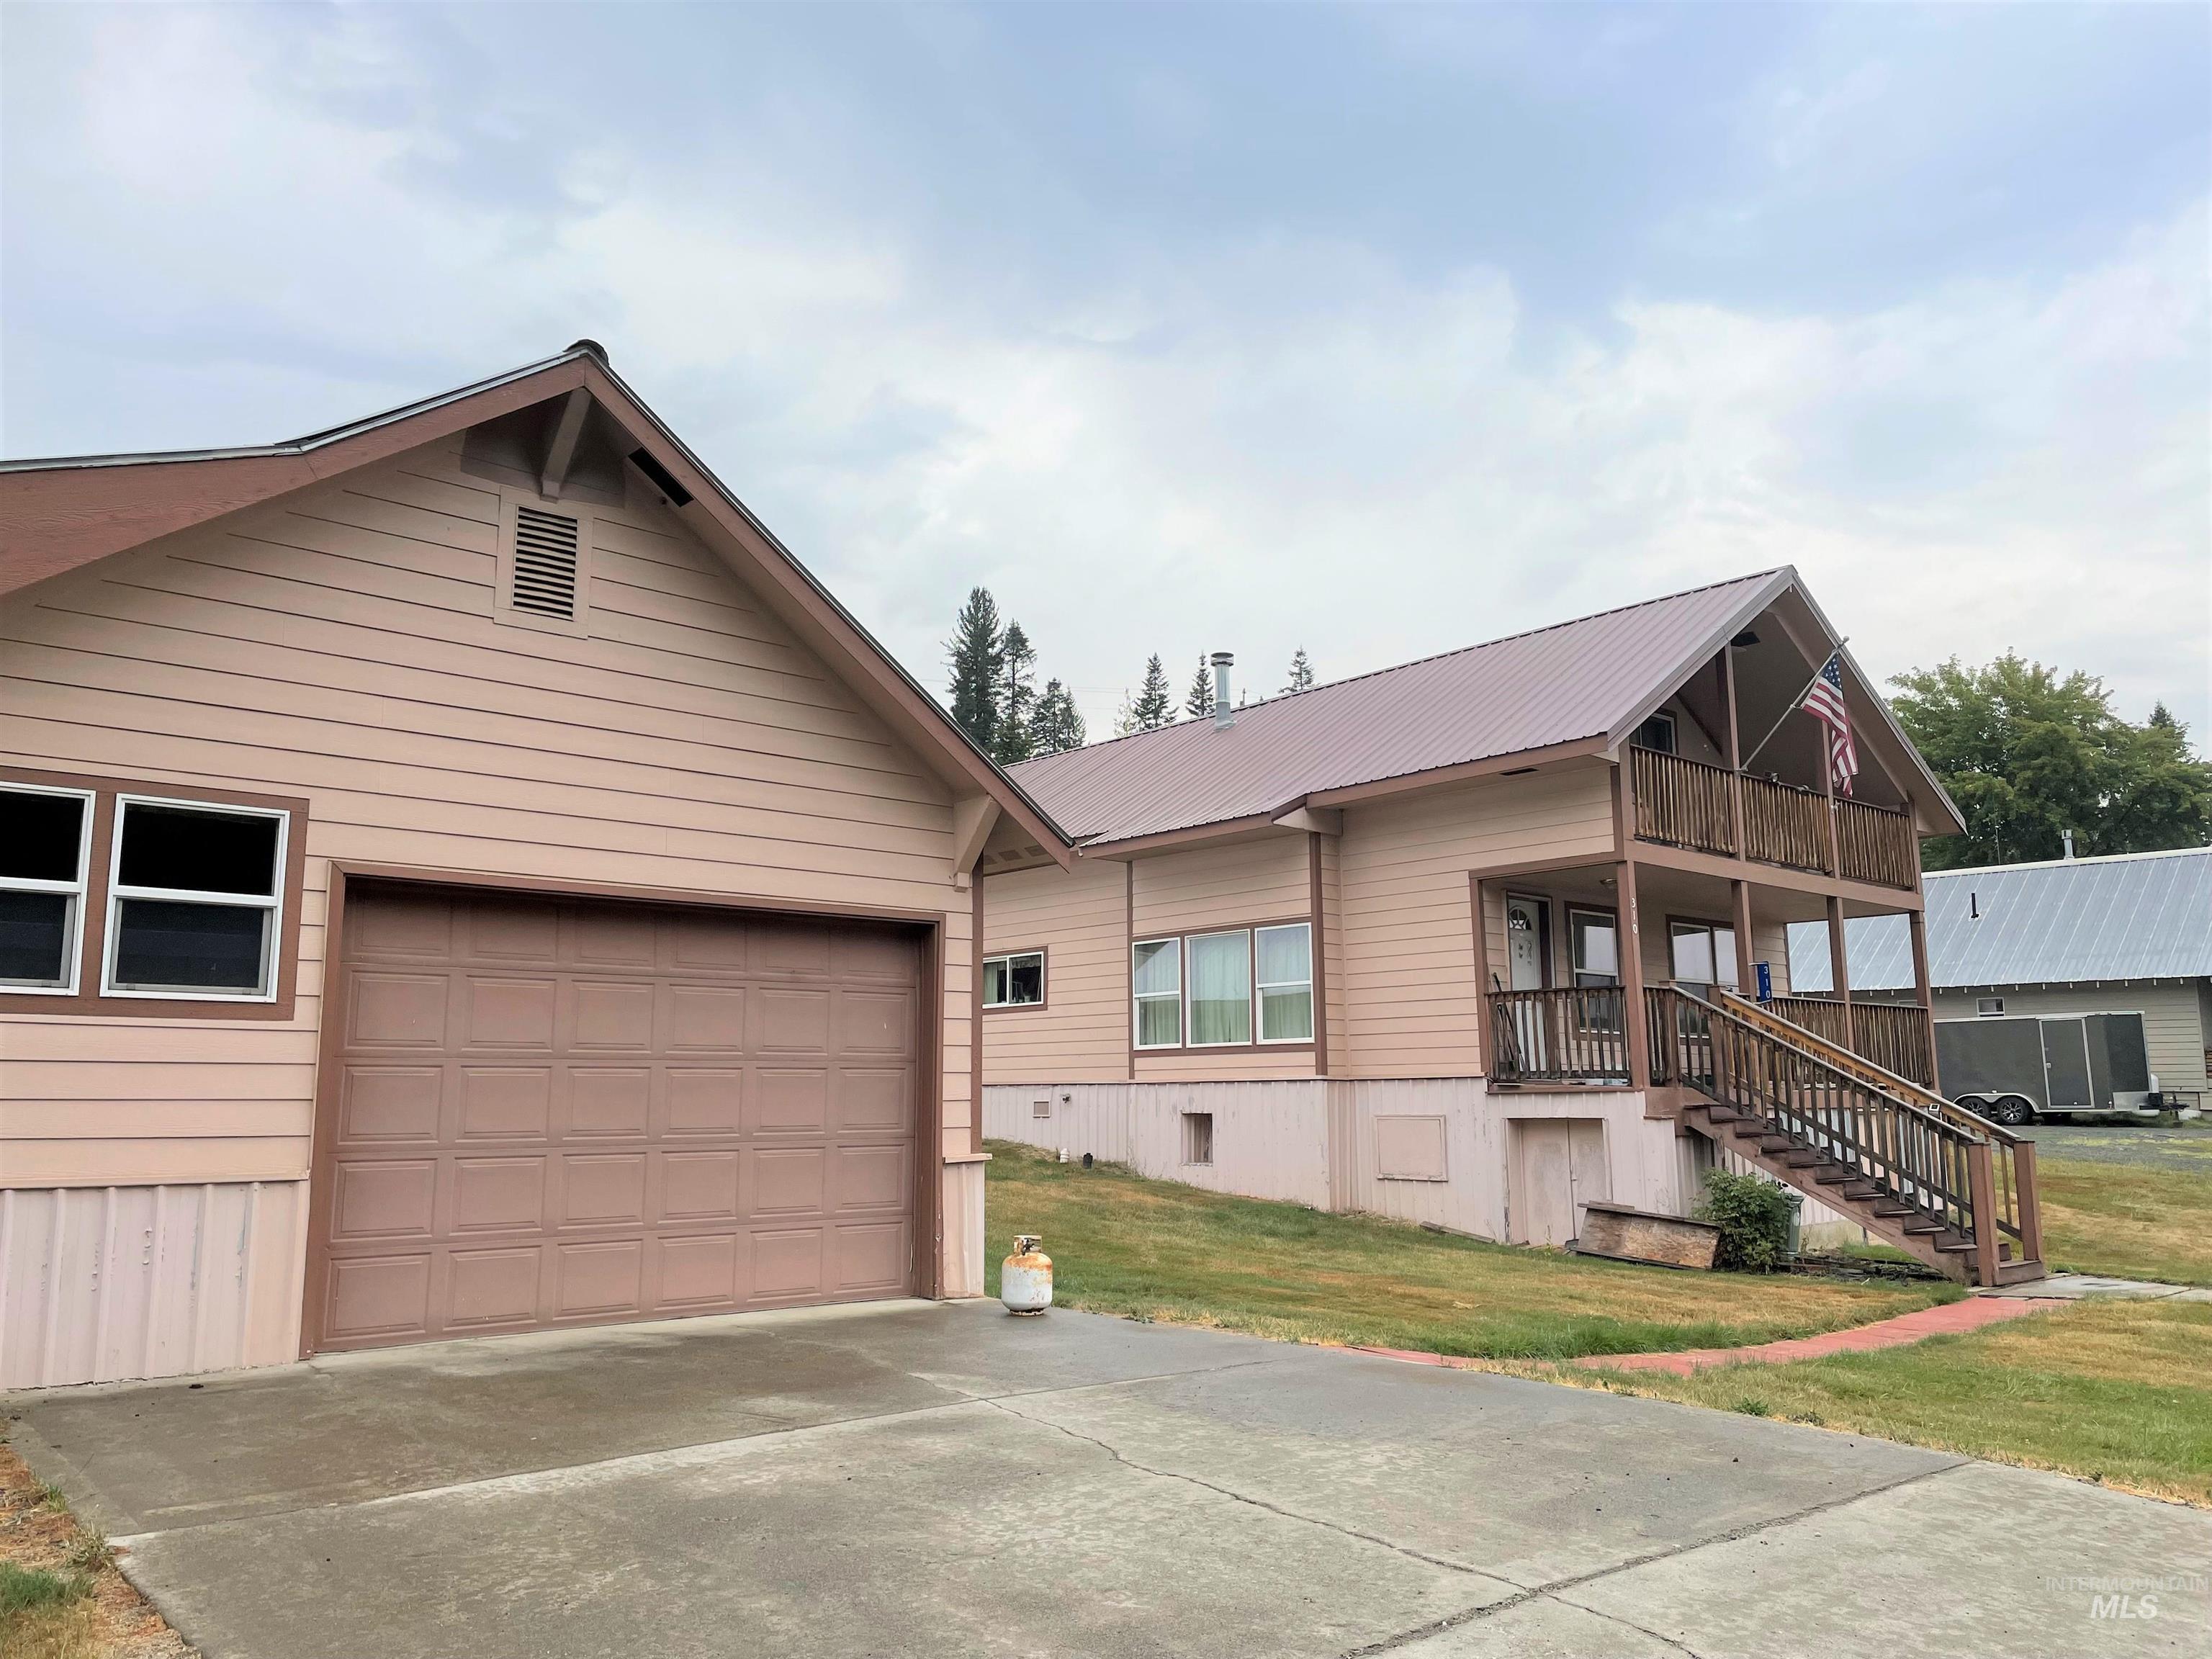 310 S 2nd, Elk River, ID 83827